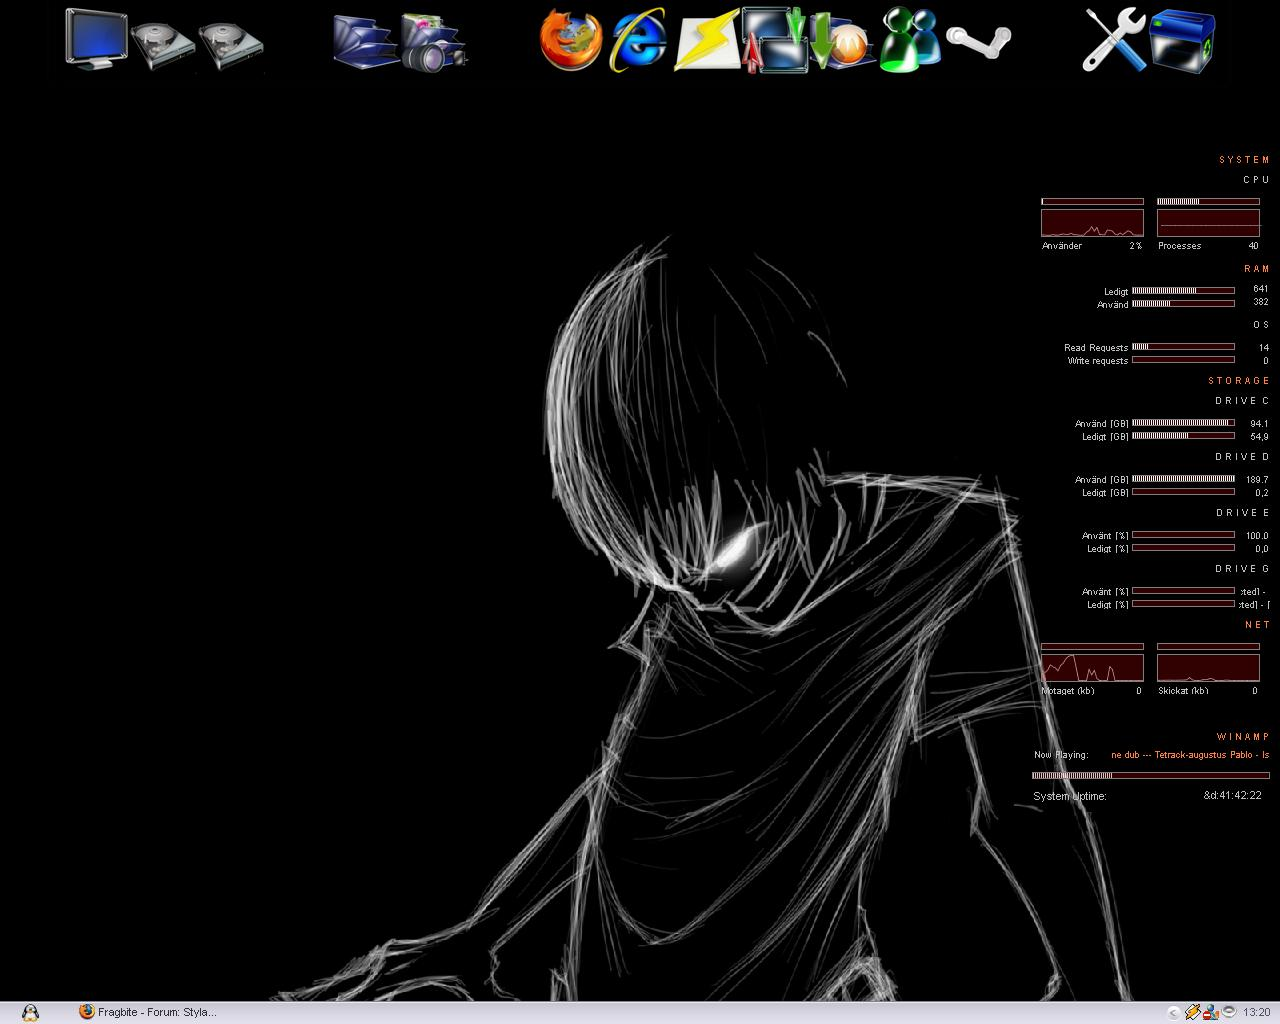 Title: My desktop.